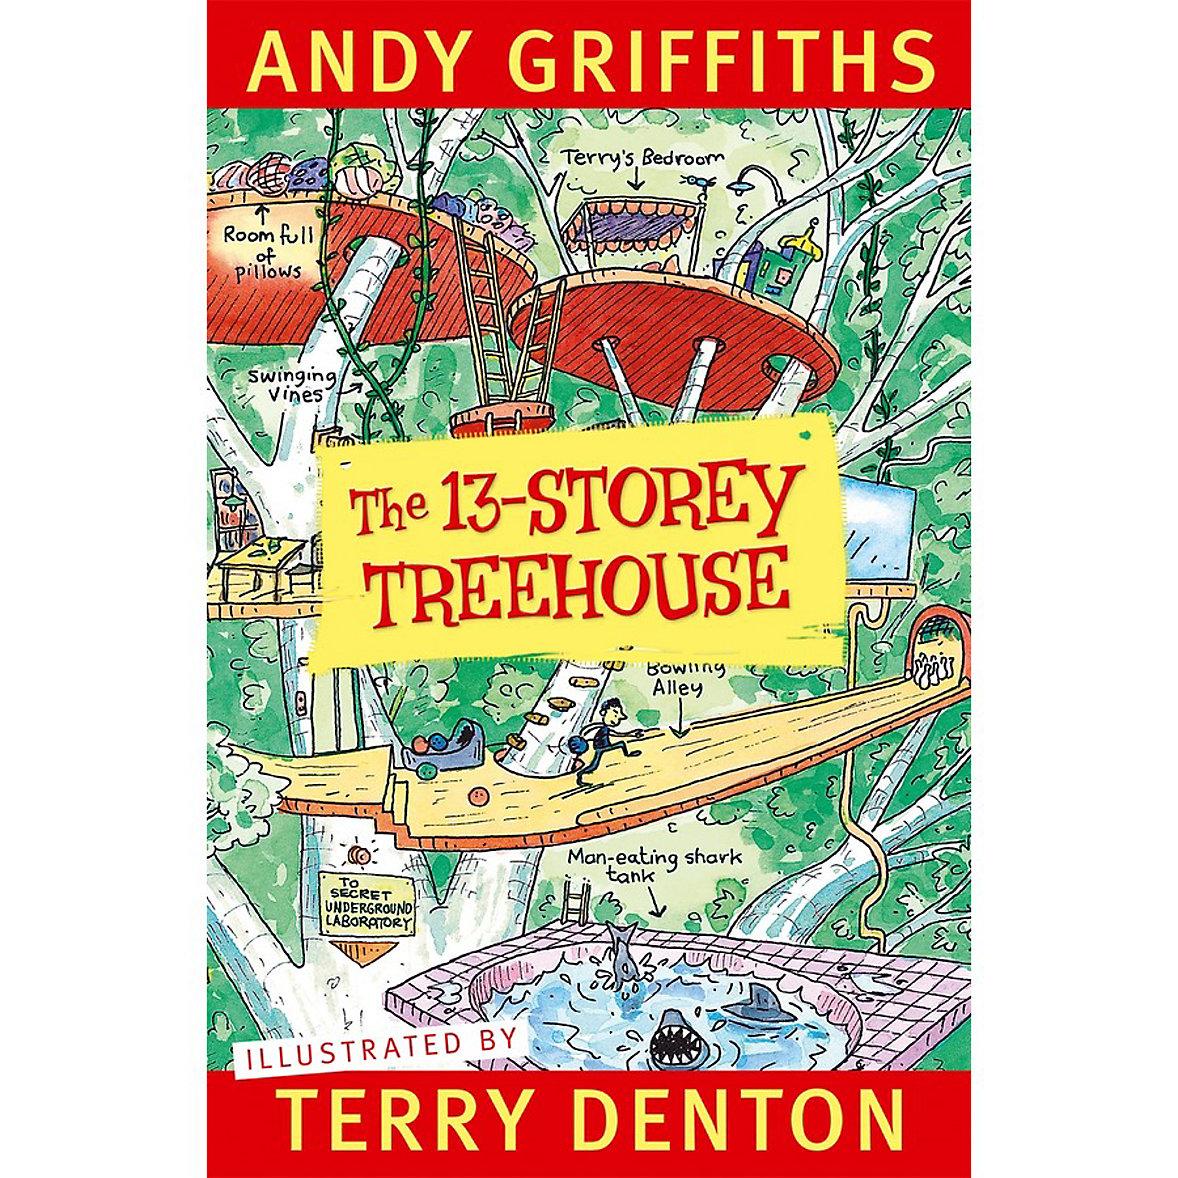 The 13 Storey Treehouse